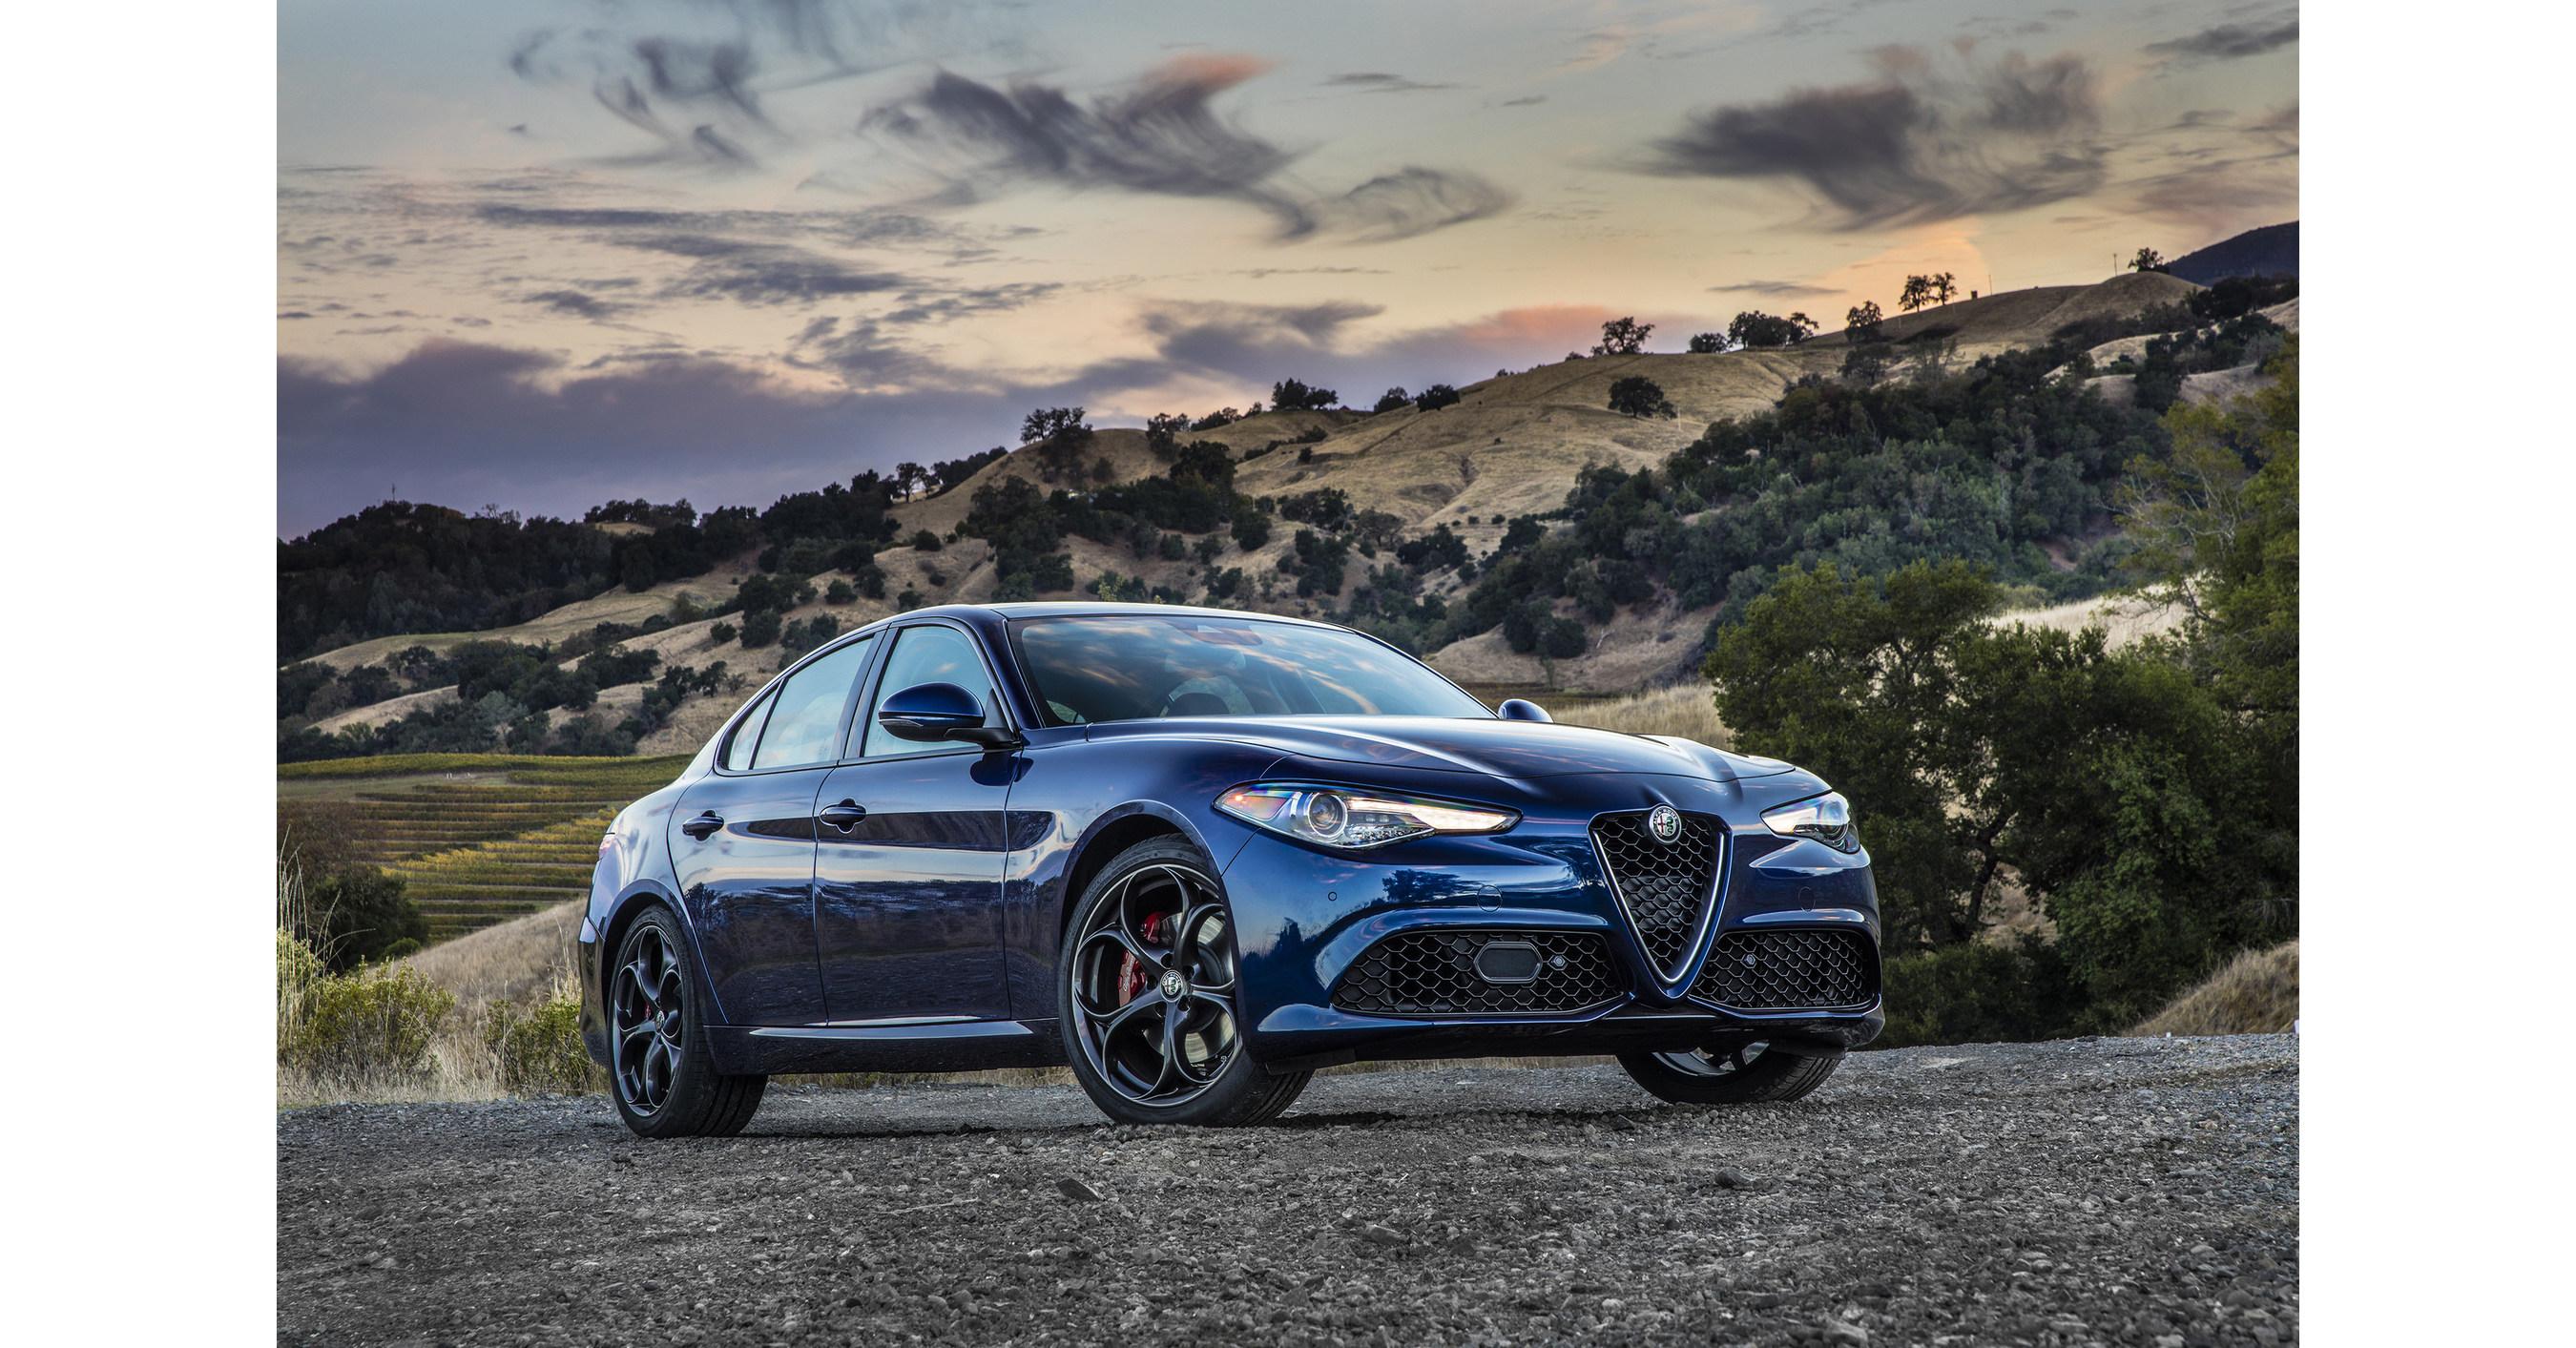 Alfa Romeo Giulia Named Motor Trend's 2018 Car Of The Year®